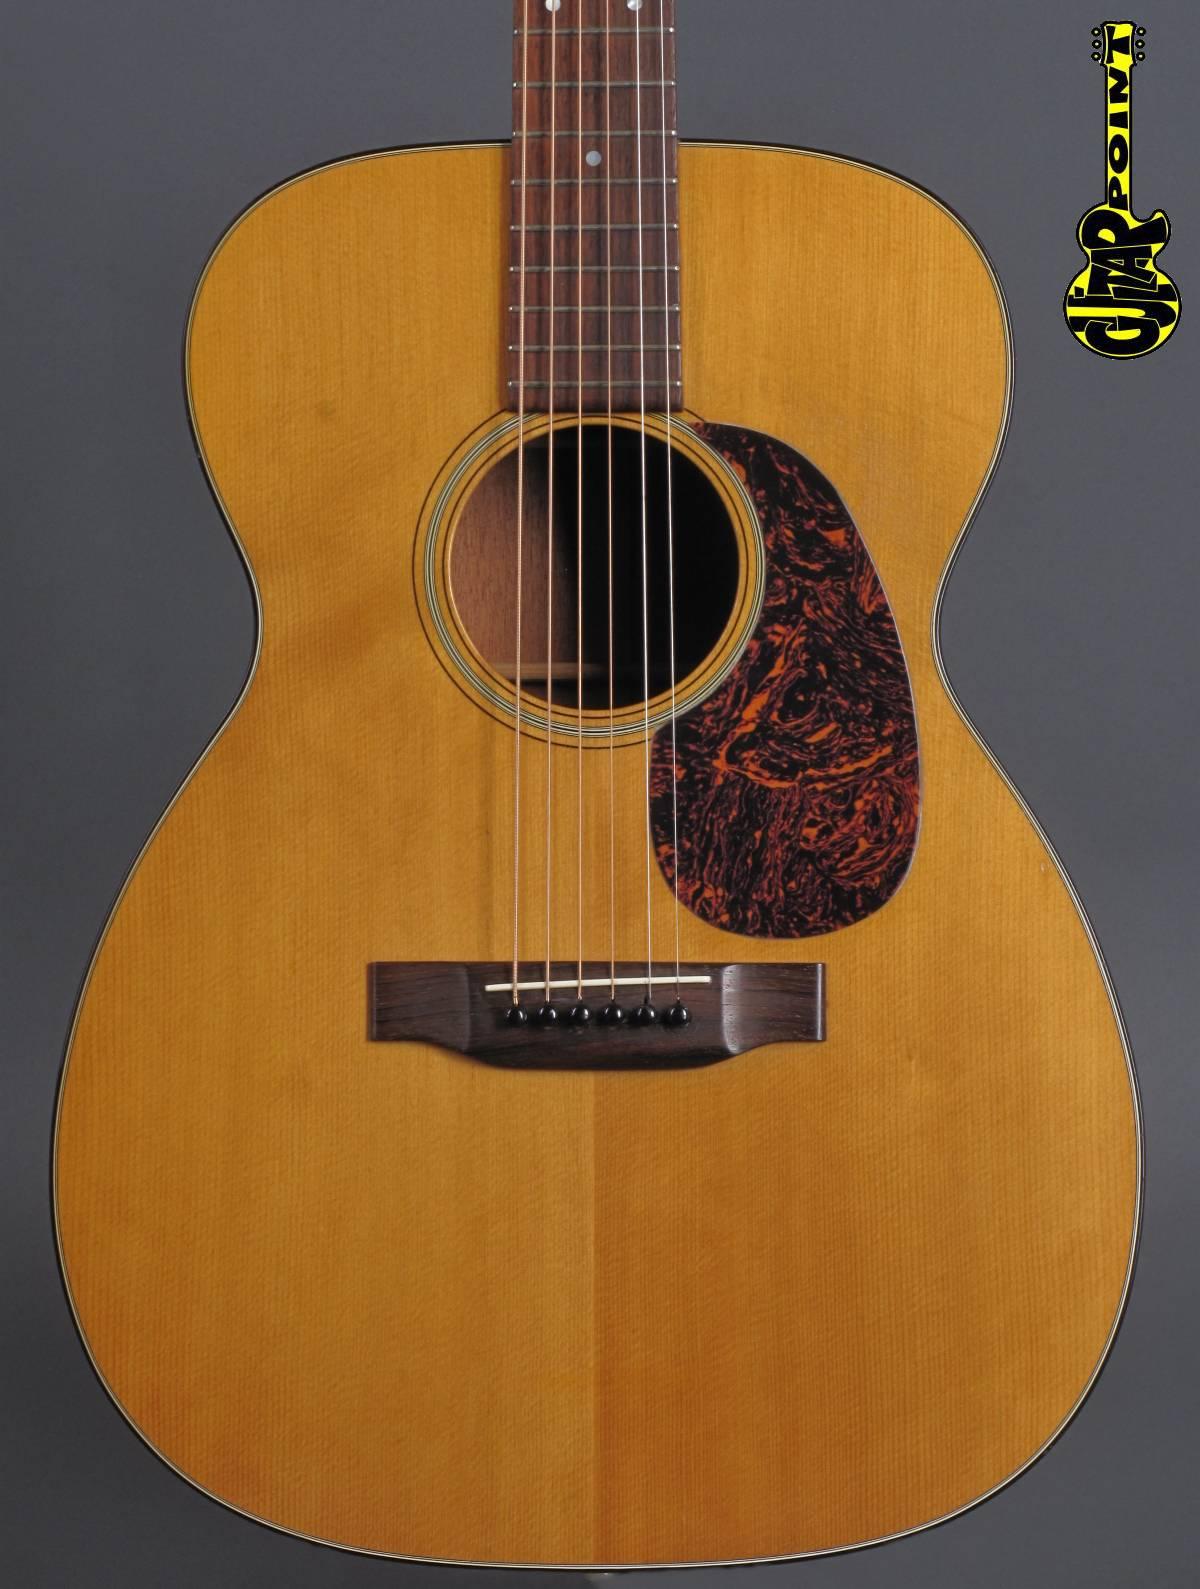 1971 Martin 00-18 - Natural